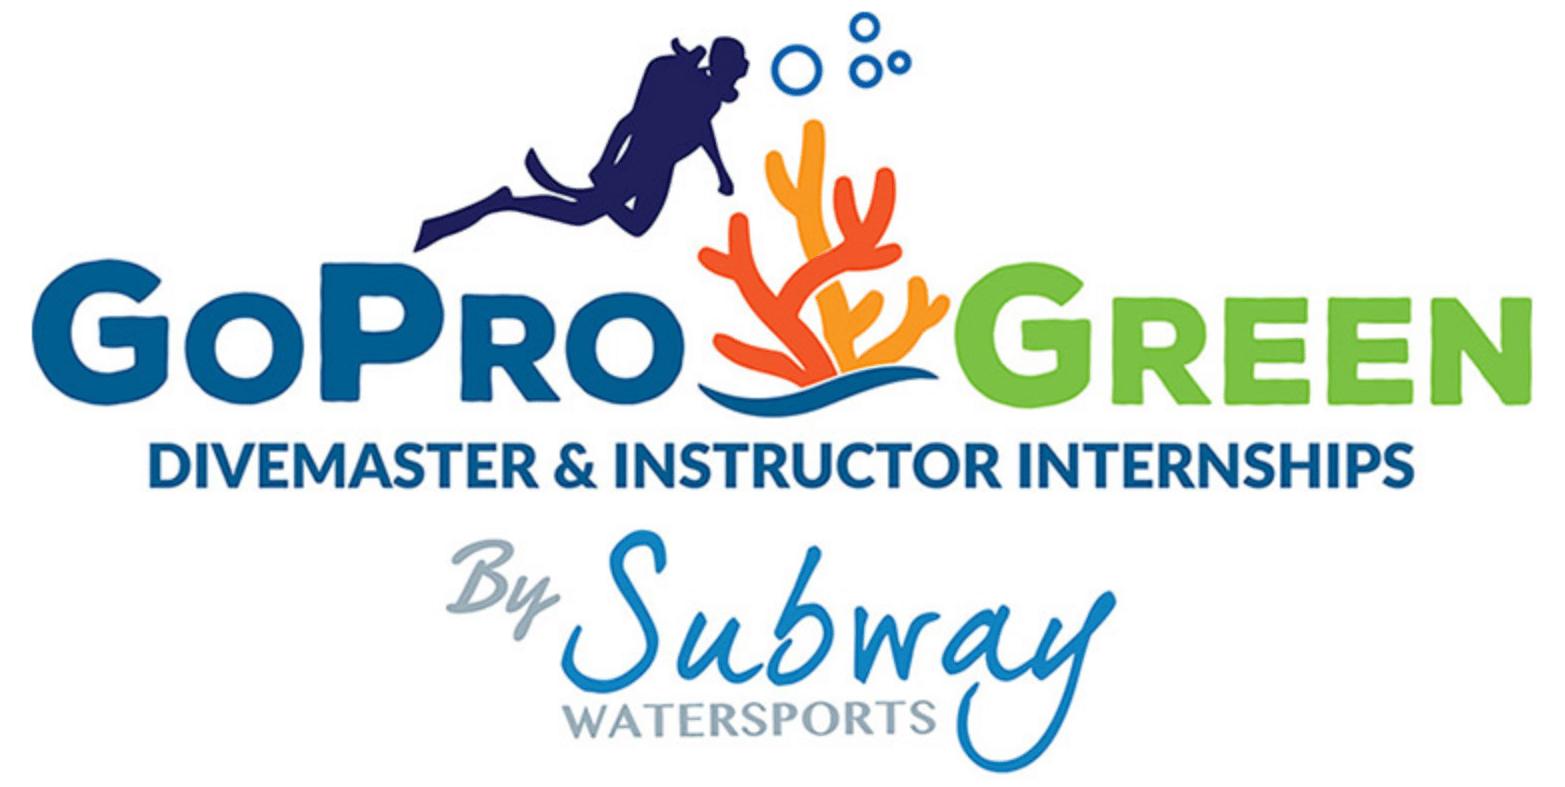 Subway Watersports Unveils New Eco-Friendly Divemaster Internship Program